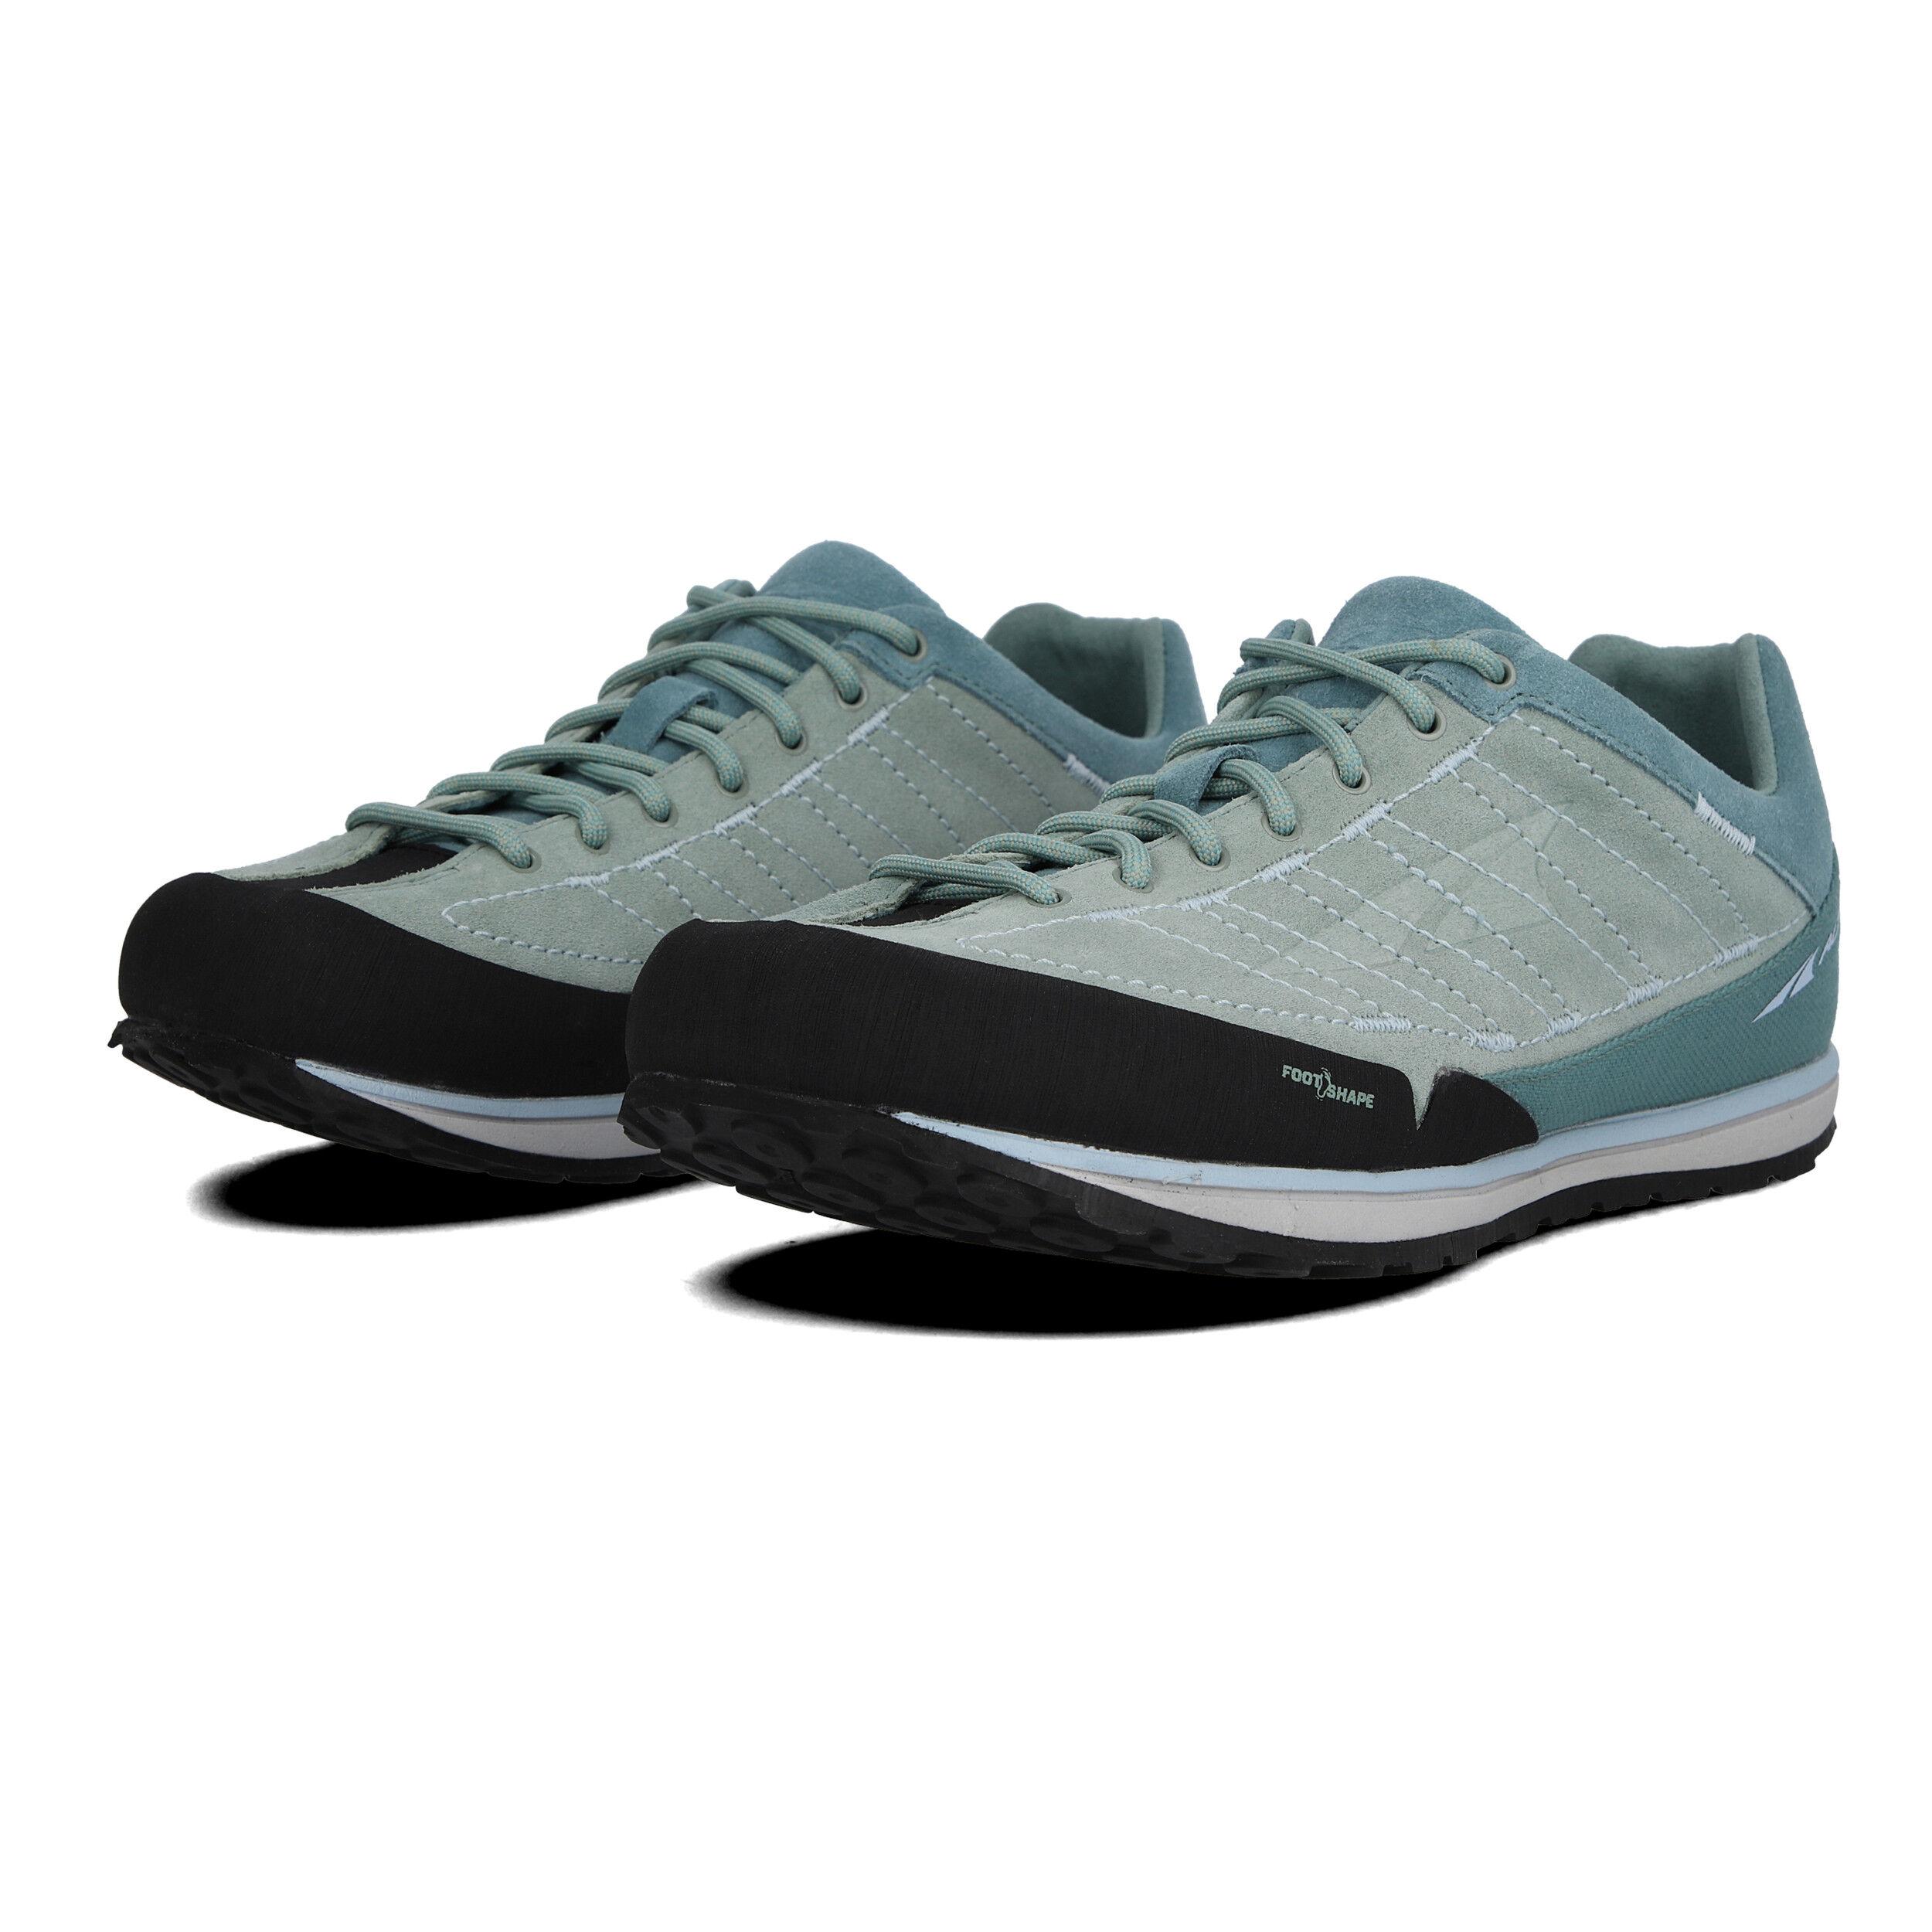 Altra Grafton Women's Outdoor Shoes - Blue - womens - Size: 43